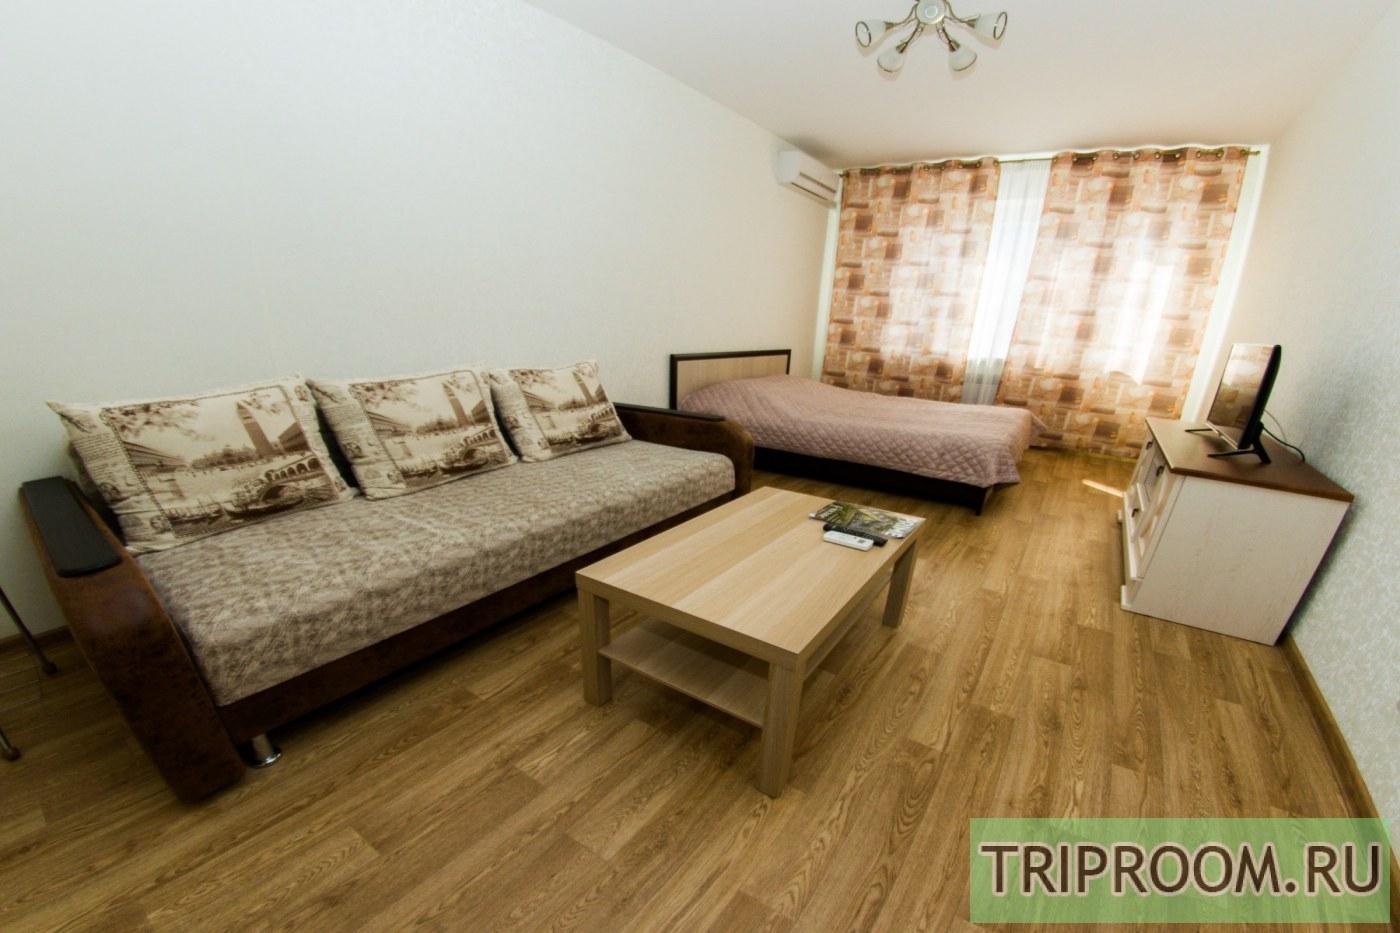 1-комнатная квартира посуточно (вариант № 39814), ул. Ленинский проспект, фото № 1